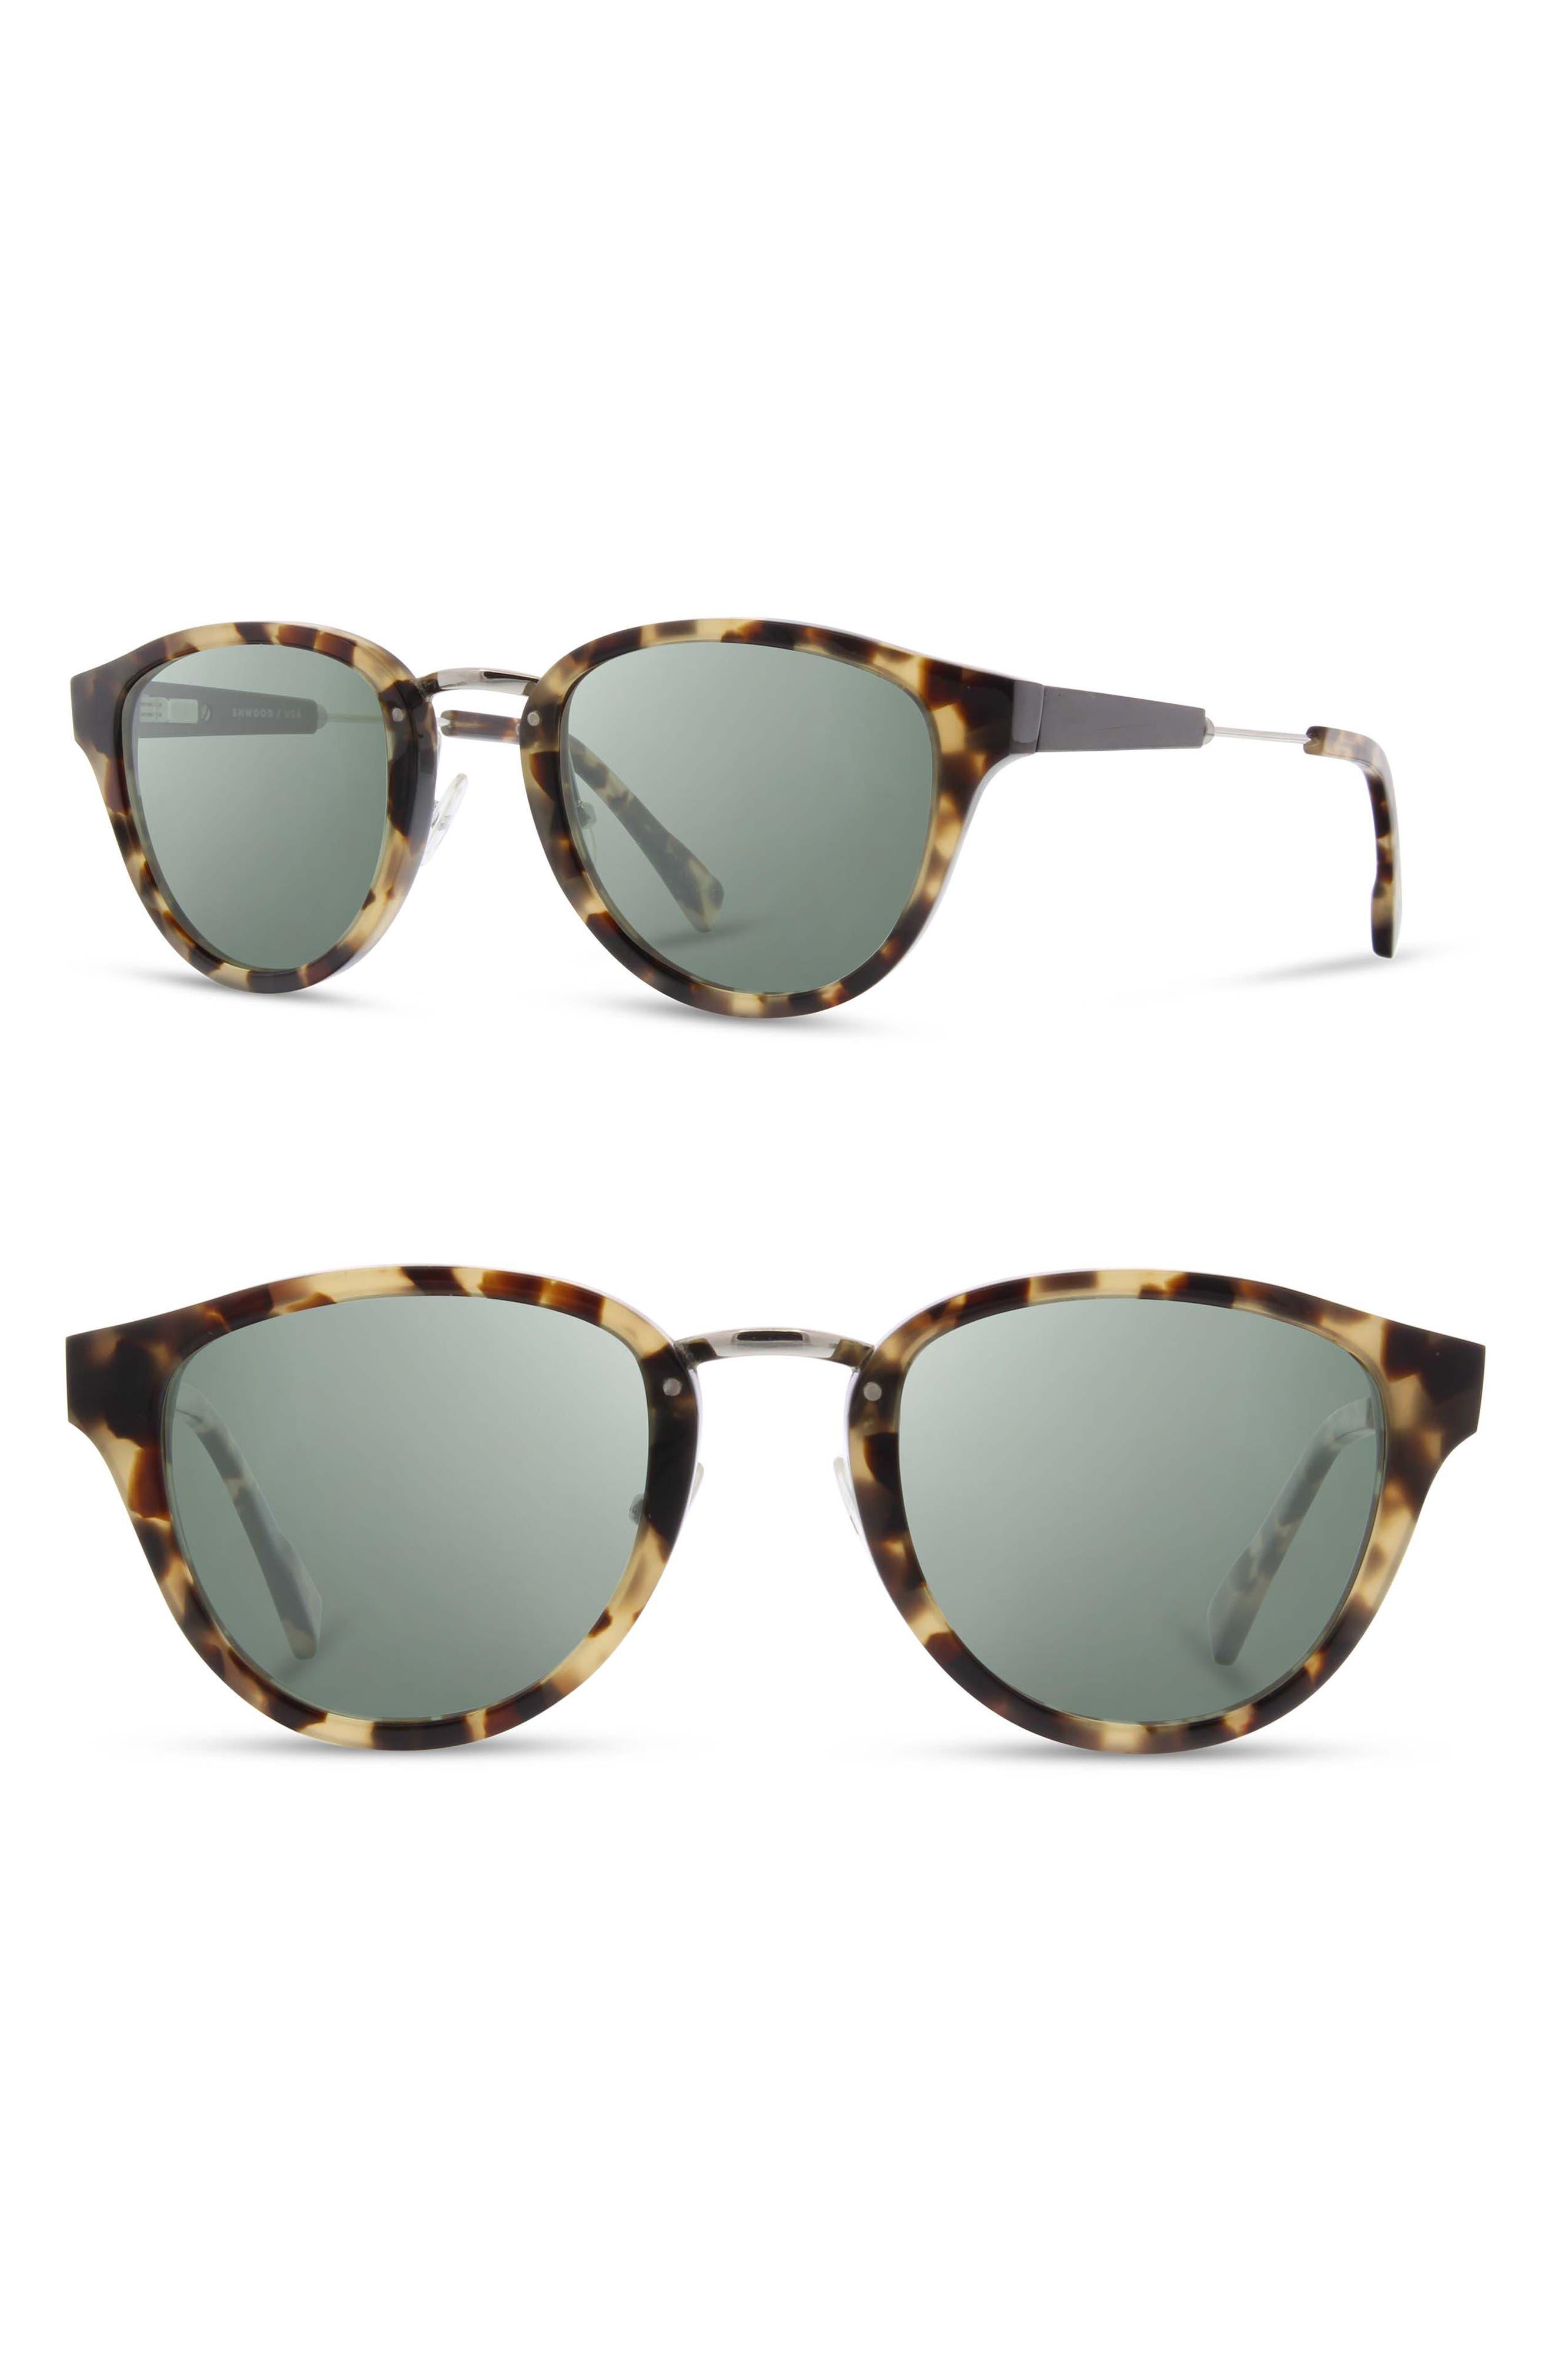 SHWOOD 'Ainsworth' 49Mm Polarized Sunglasses - Havana/ Silver/ G15